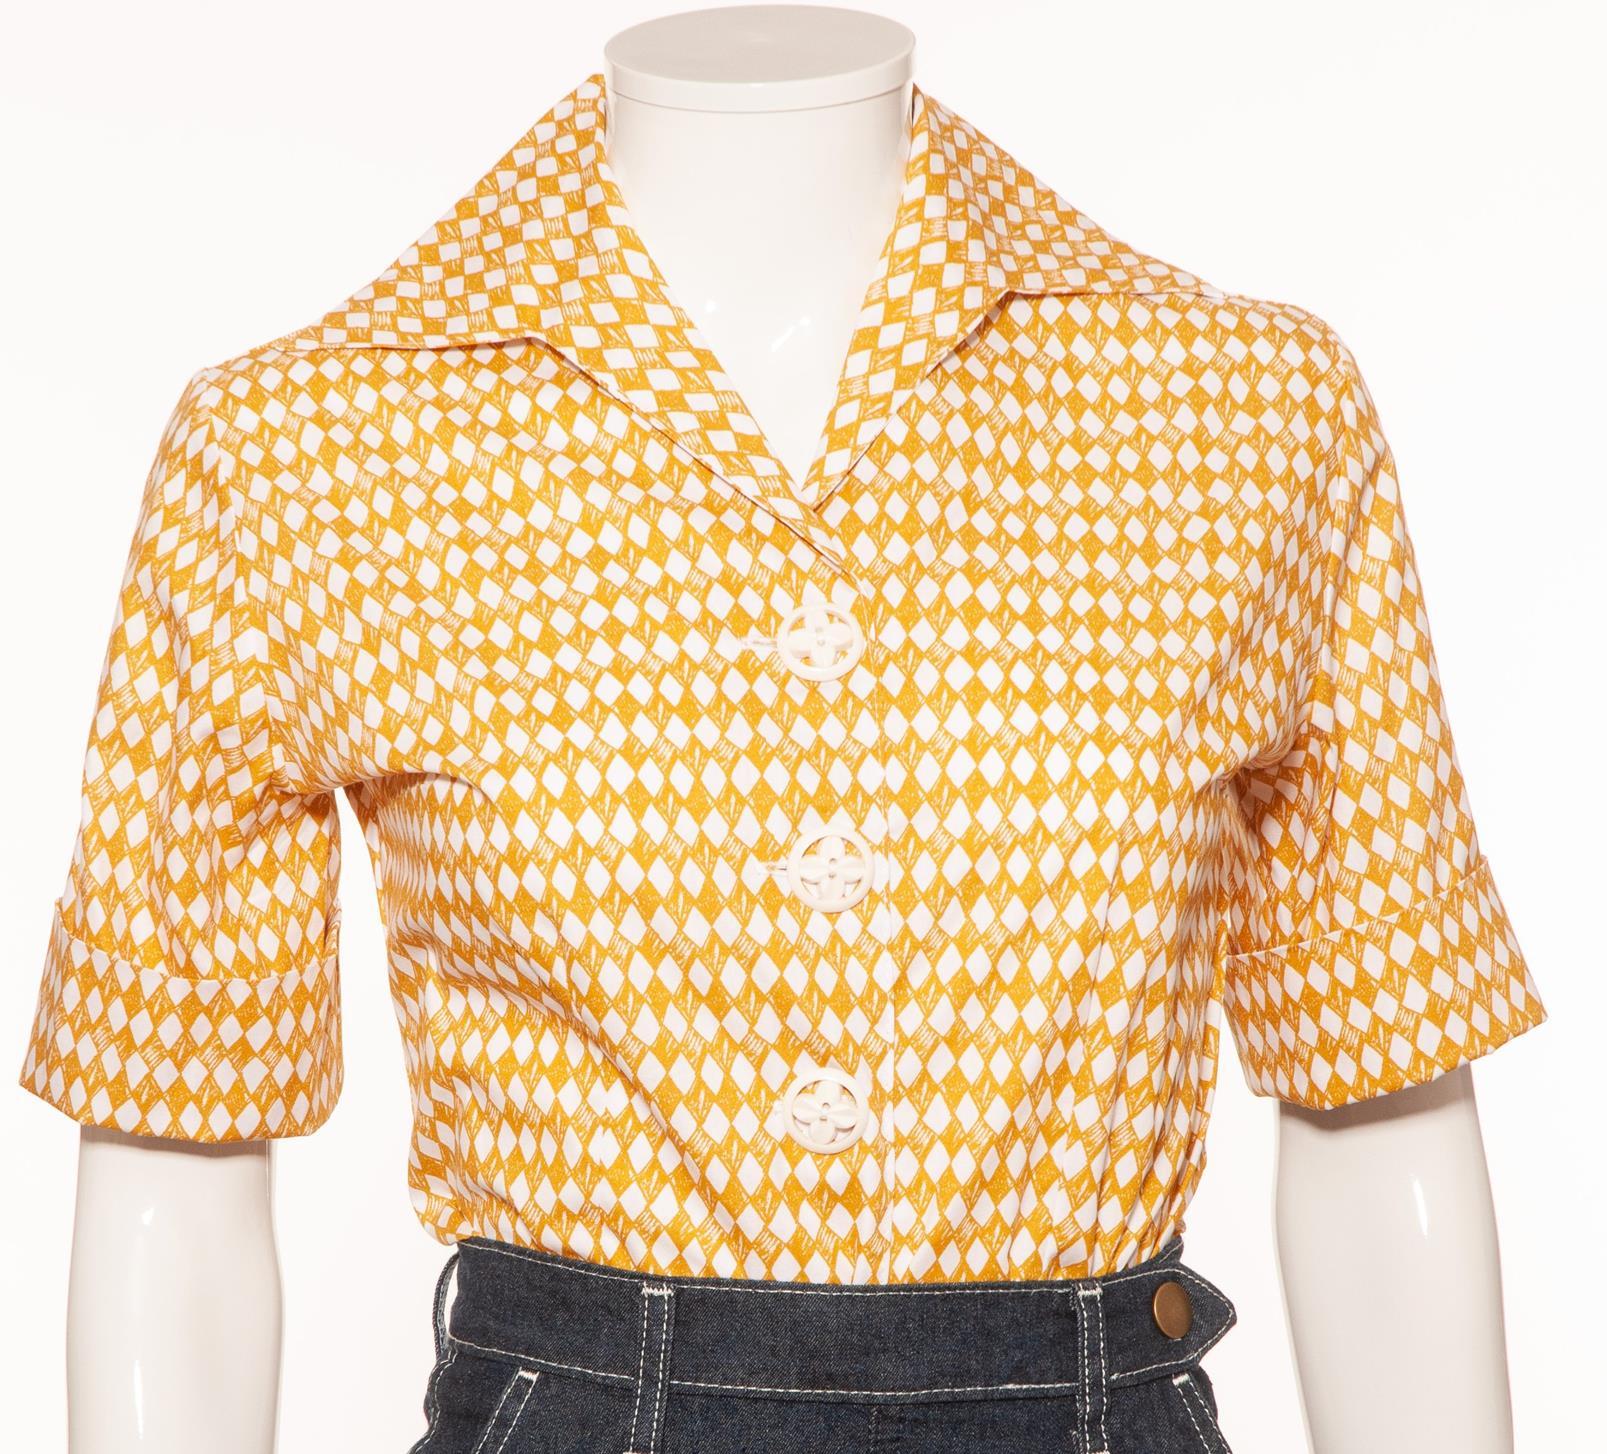 gold-diamond-1950s-blouse